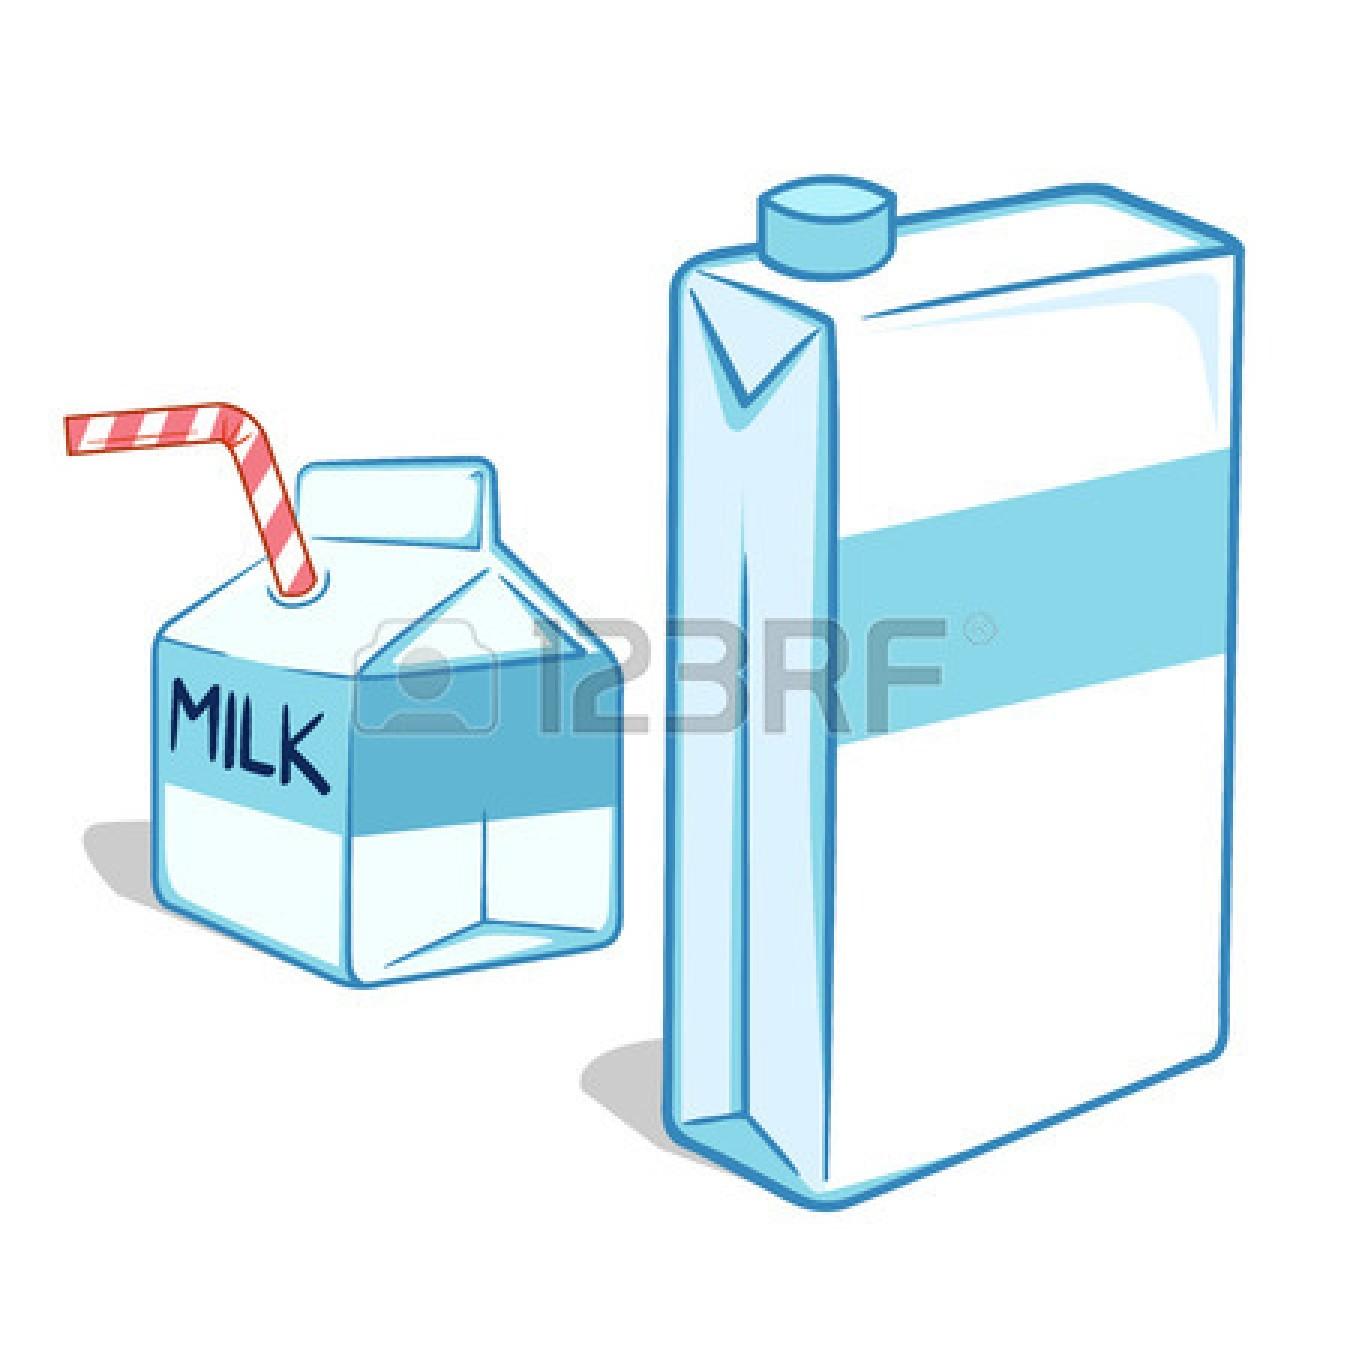 how to draw a milk carton